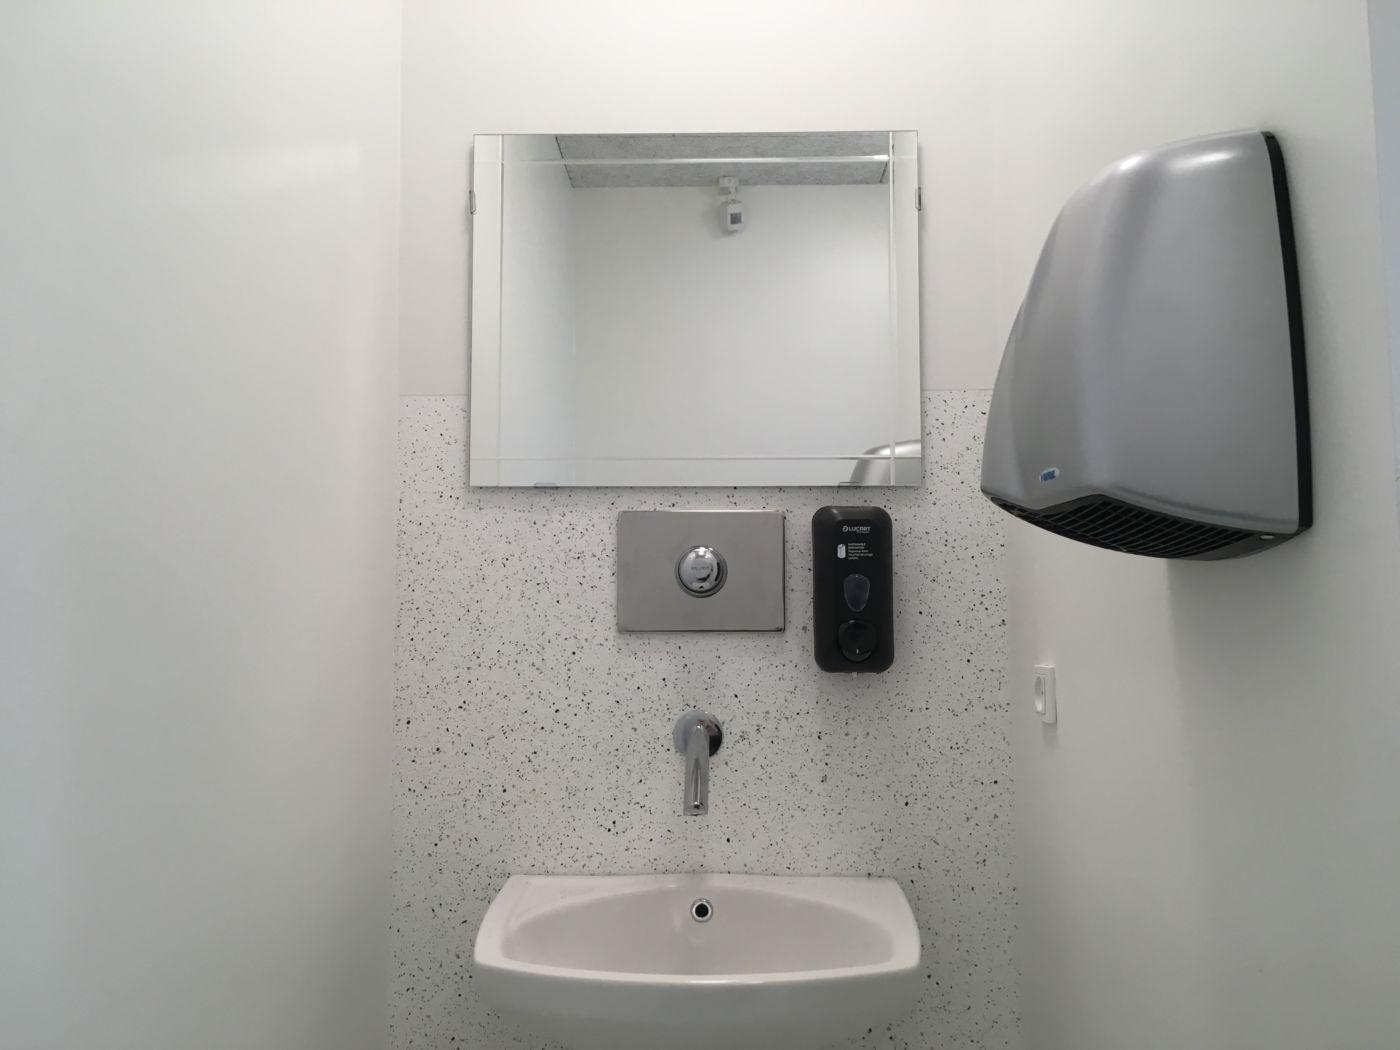 Nye toiletfaciliteter midt på pladsen